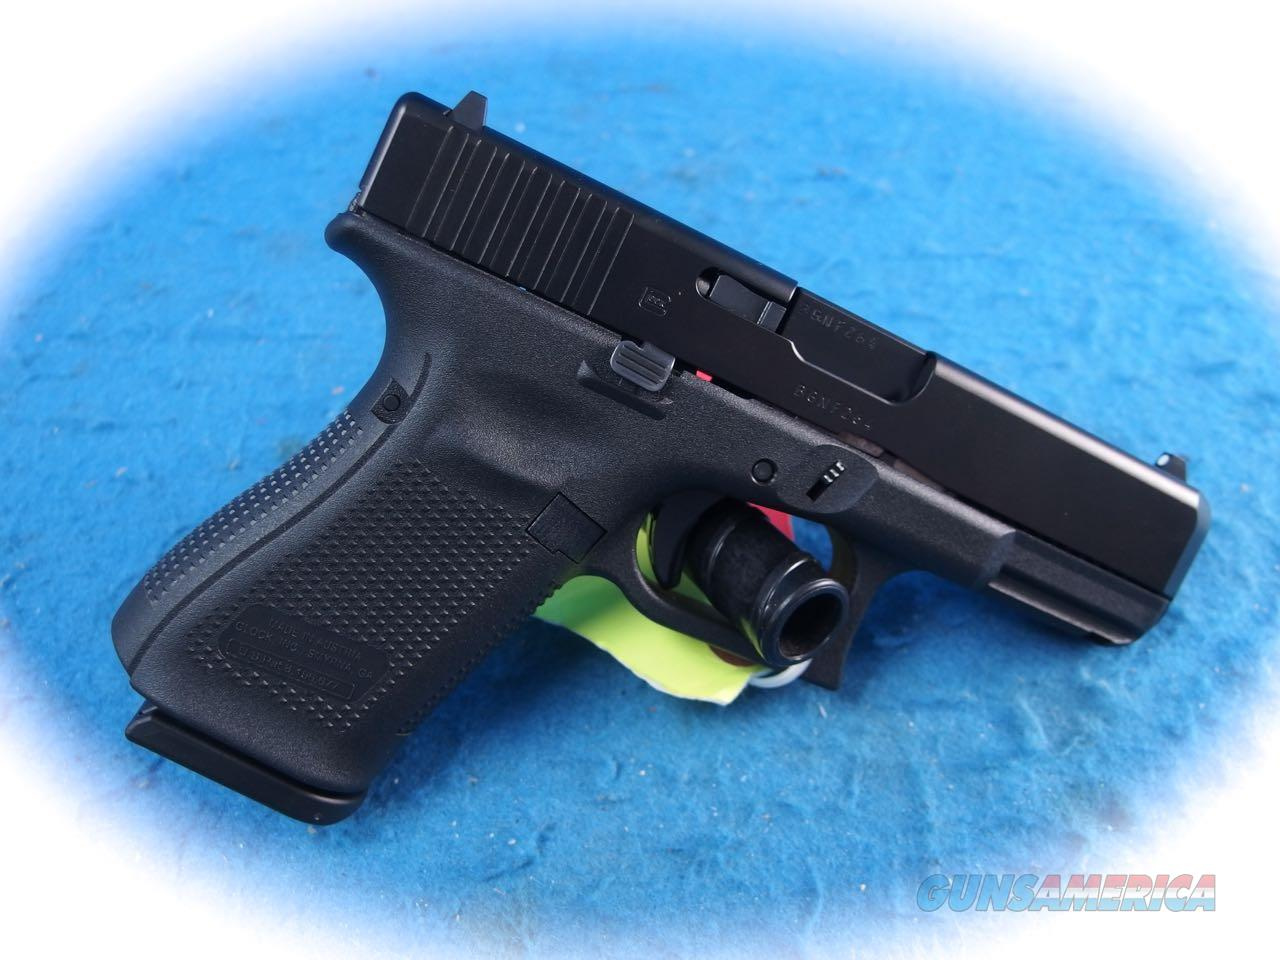 Glock 19 Gen 5 9mm Semi Auto Pistol **New**  Guns > Pistols > Glock Pistols > 19